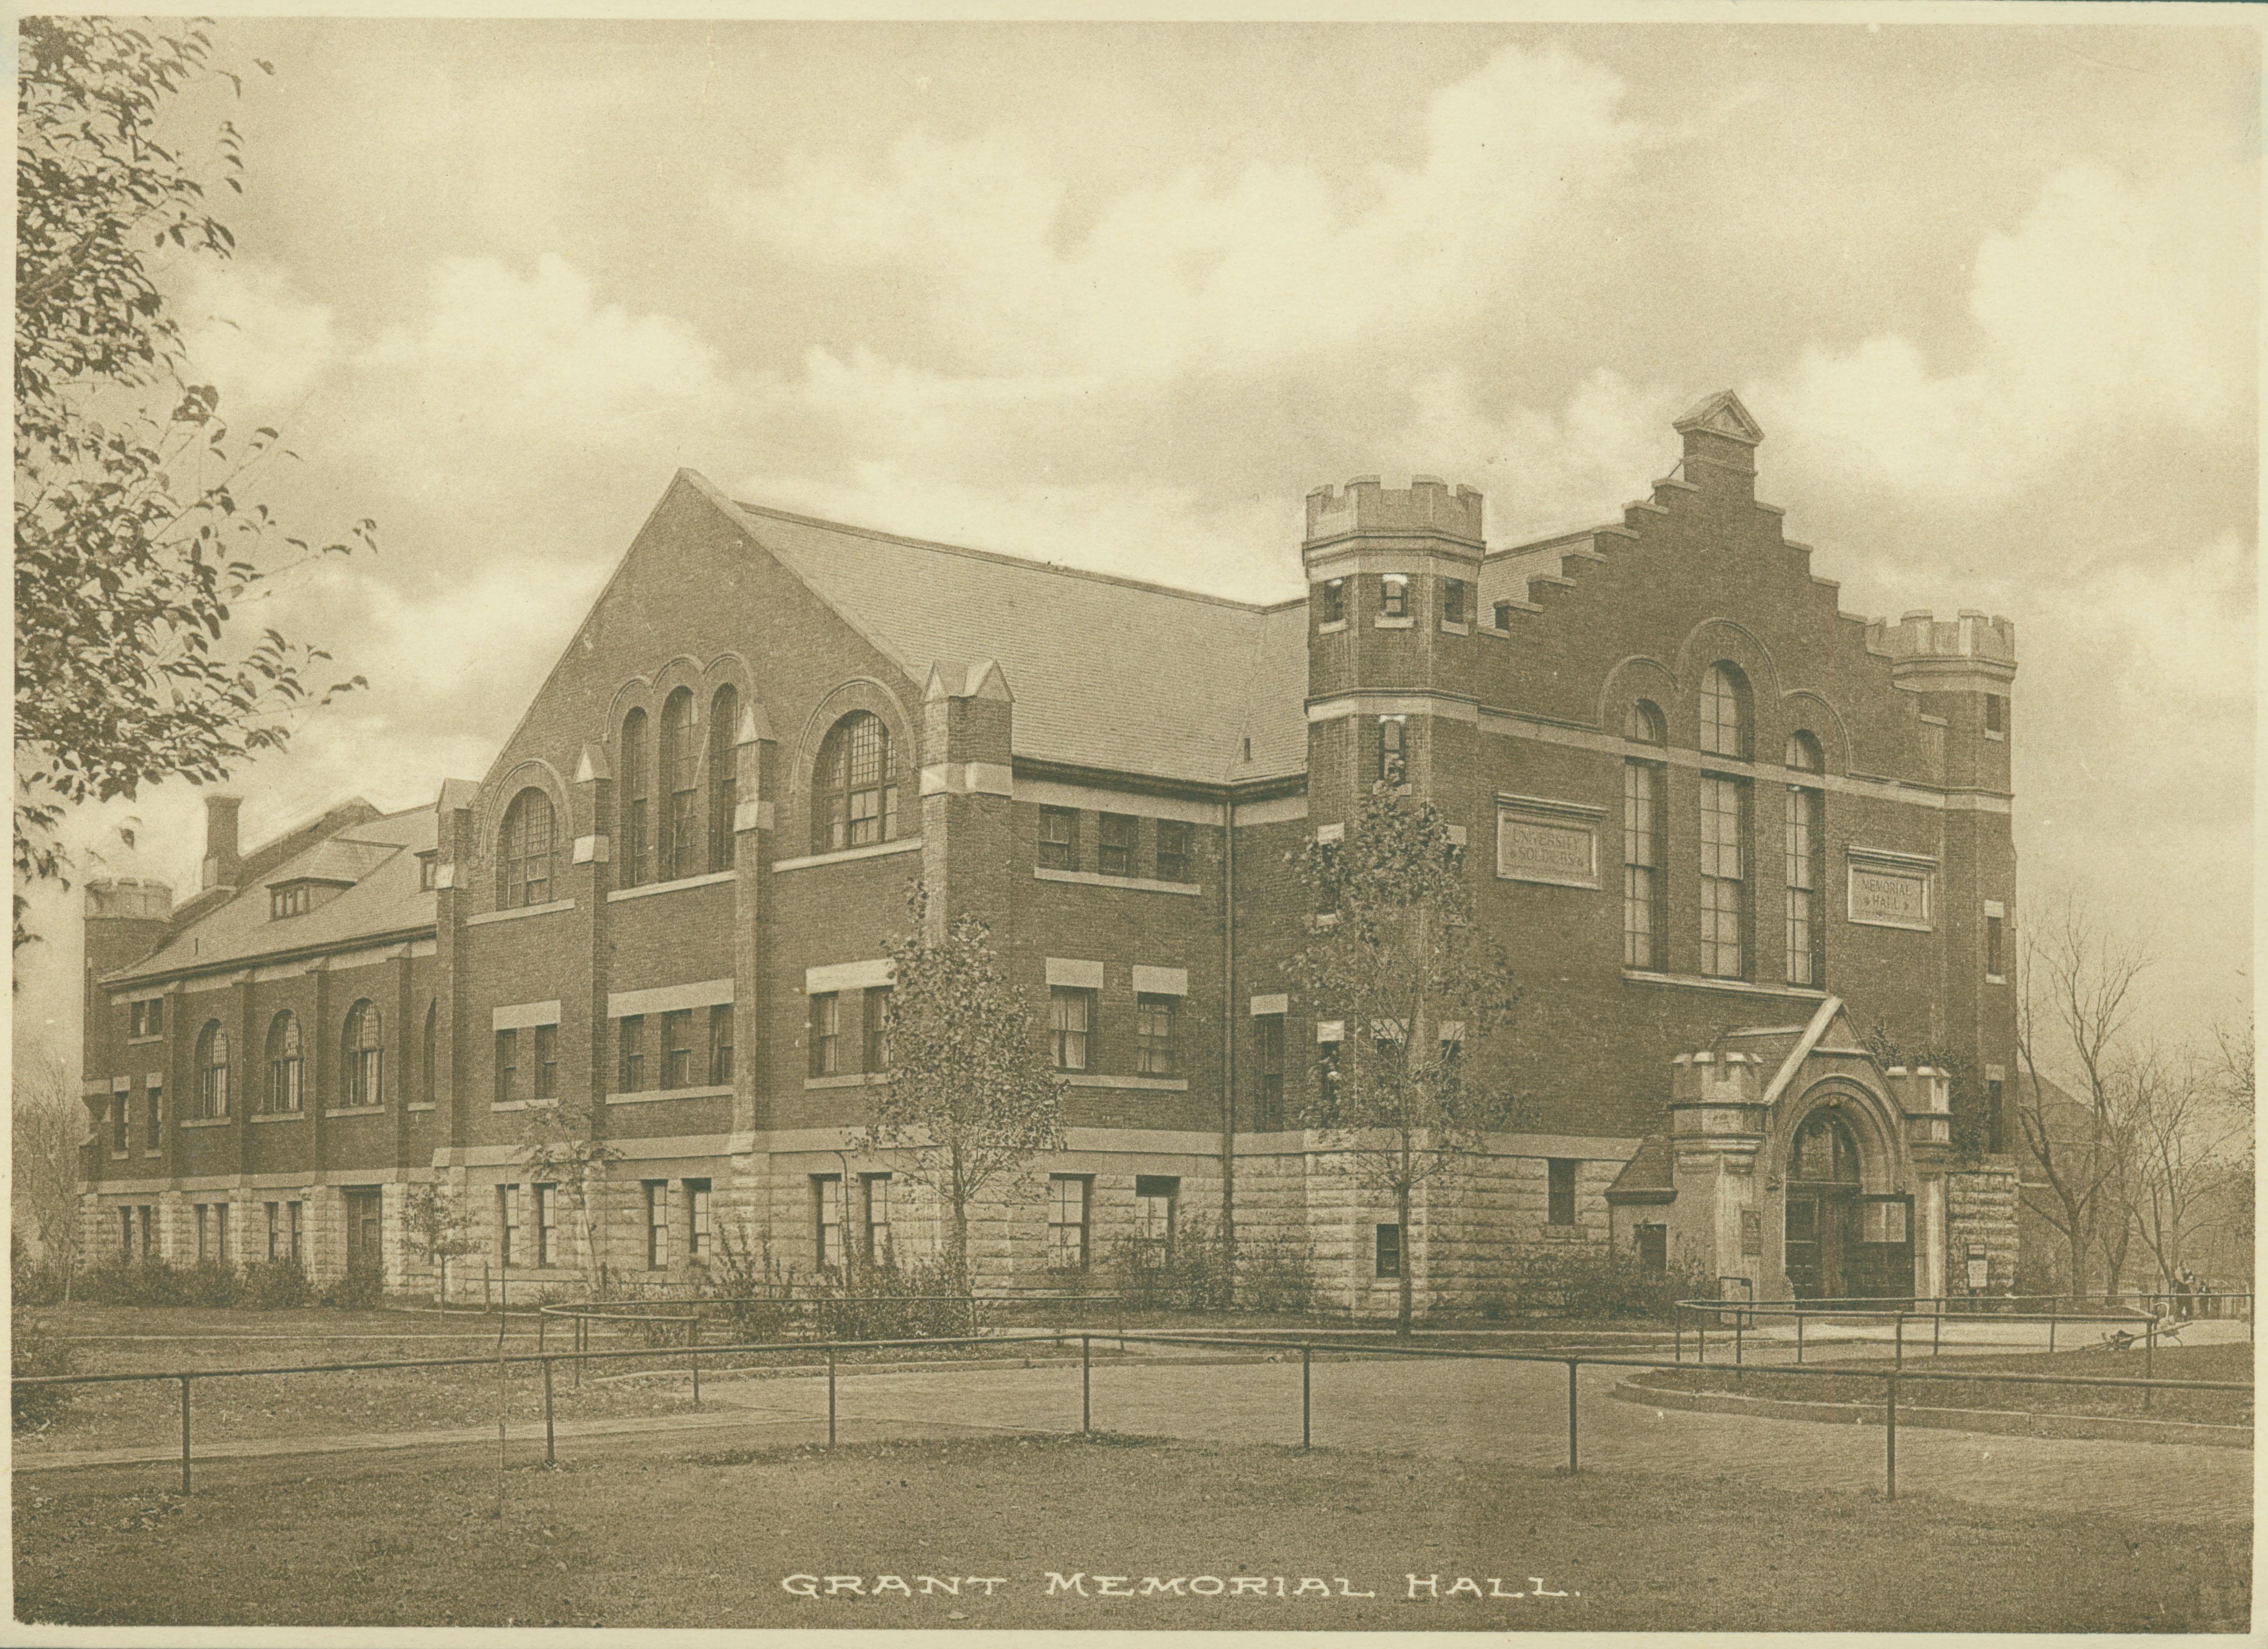 Exterior of Grant Memorial Hall